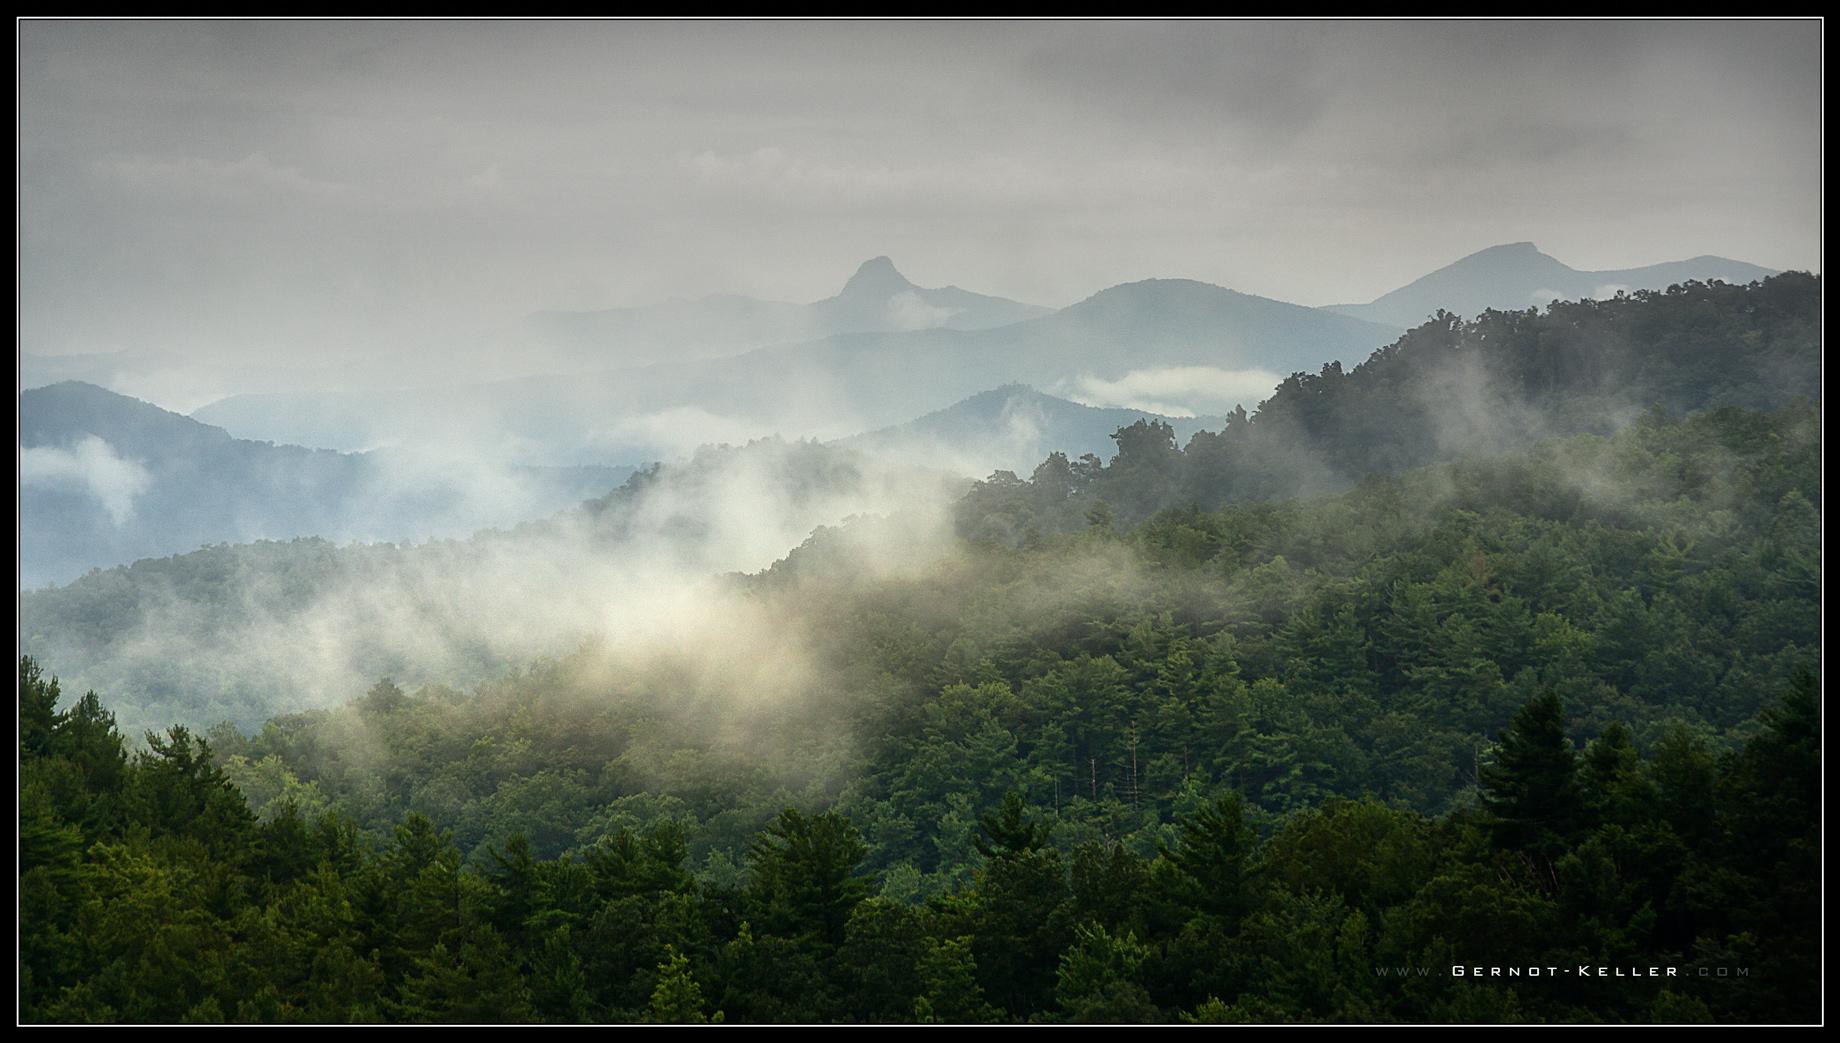 09253 - Fog along the Blue Ridge Parkway